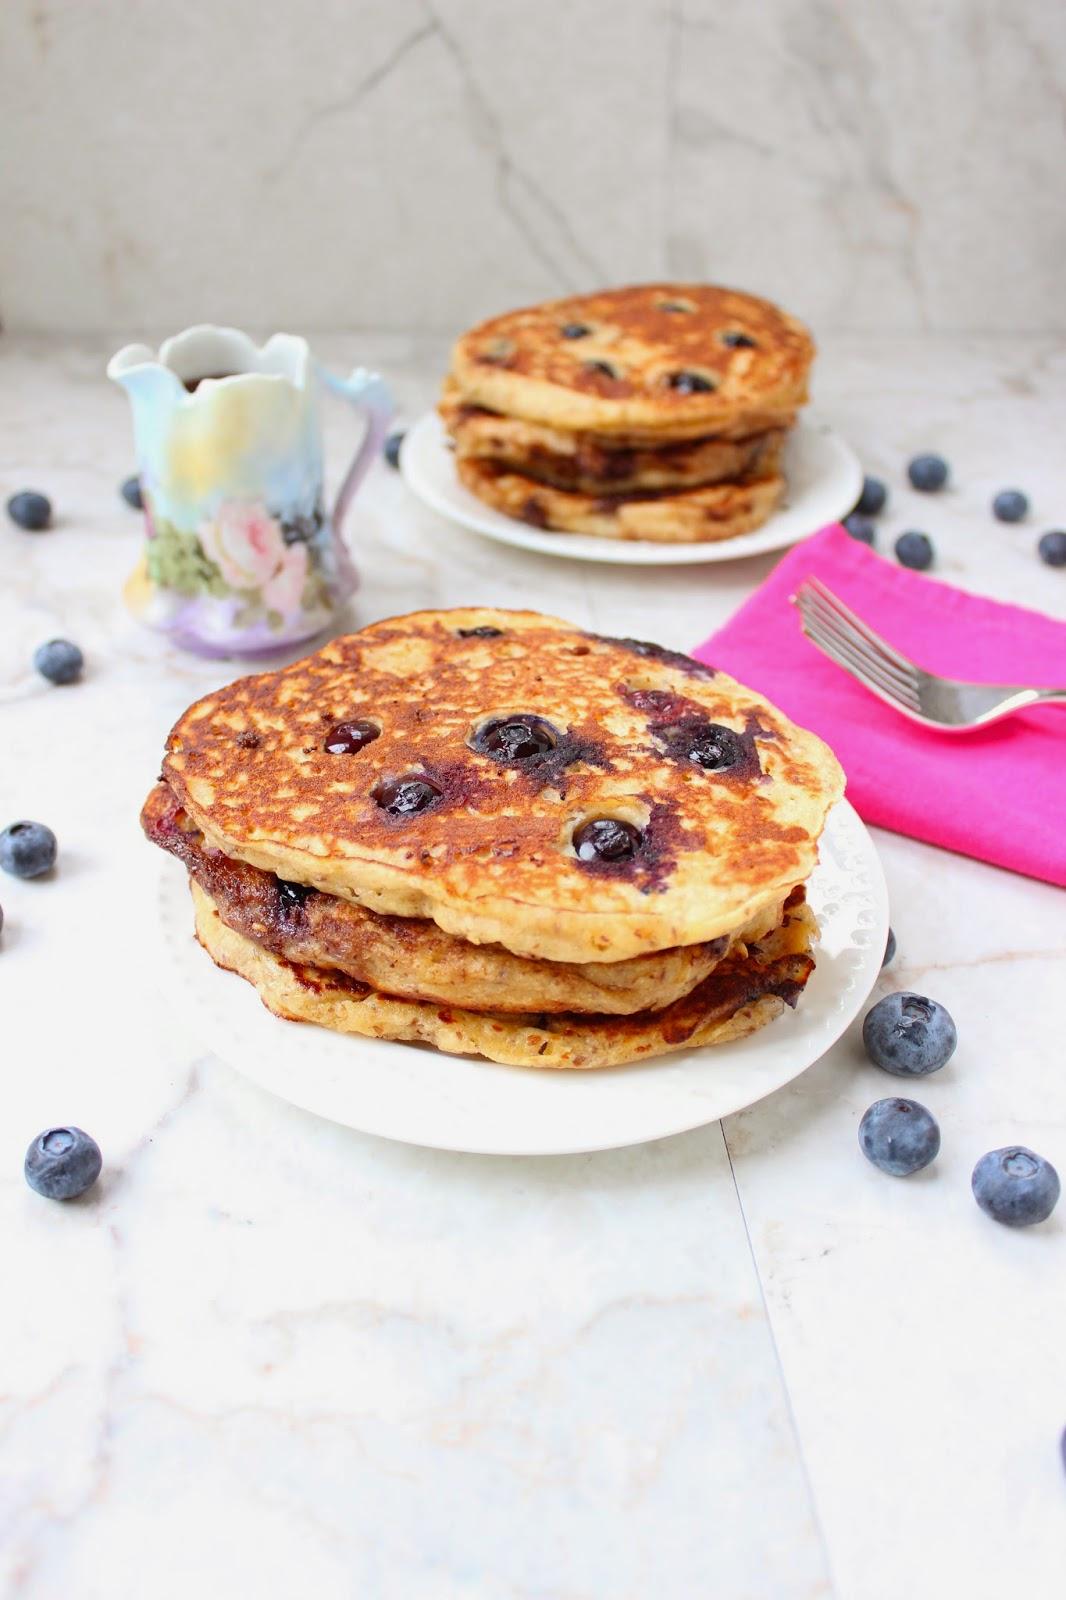 Stew or a Story: Blueberry Multi-Grain Yogurt Pancakes